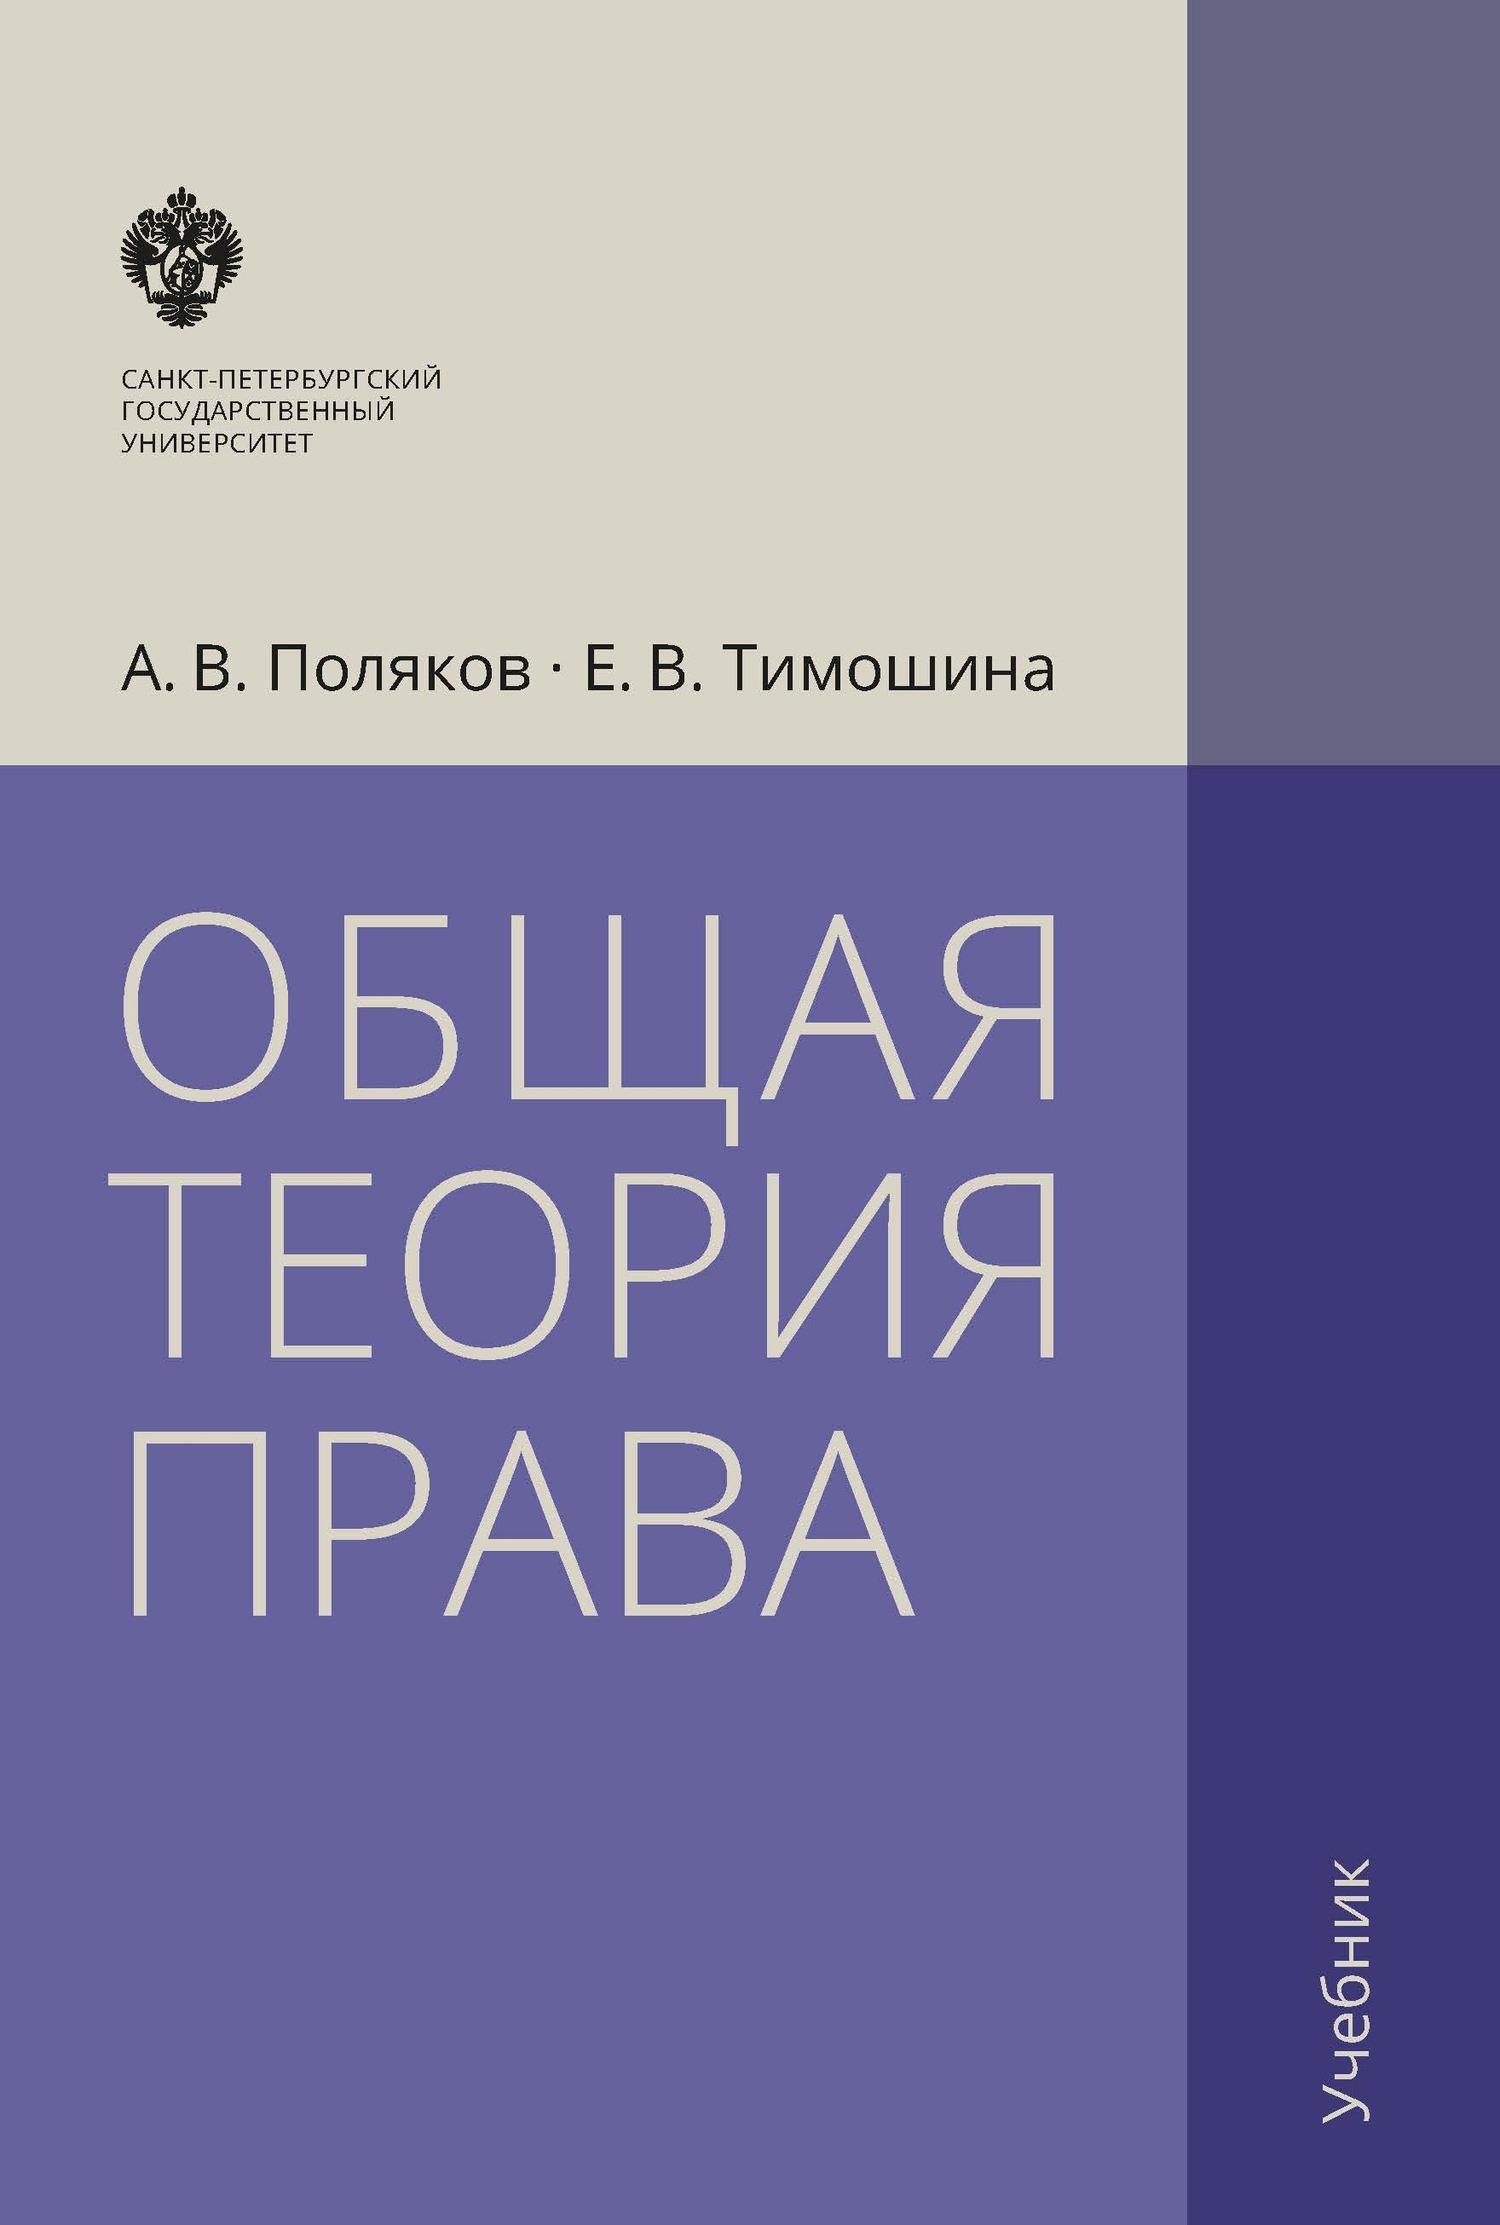 Е. В. Тимошина Общая теория права. Учебник купить щенка кане корсо в спб